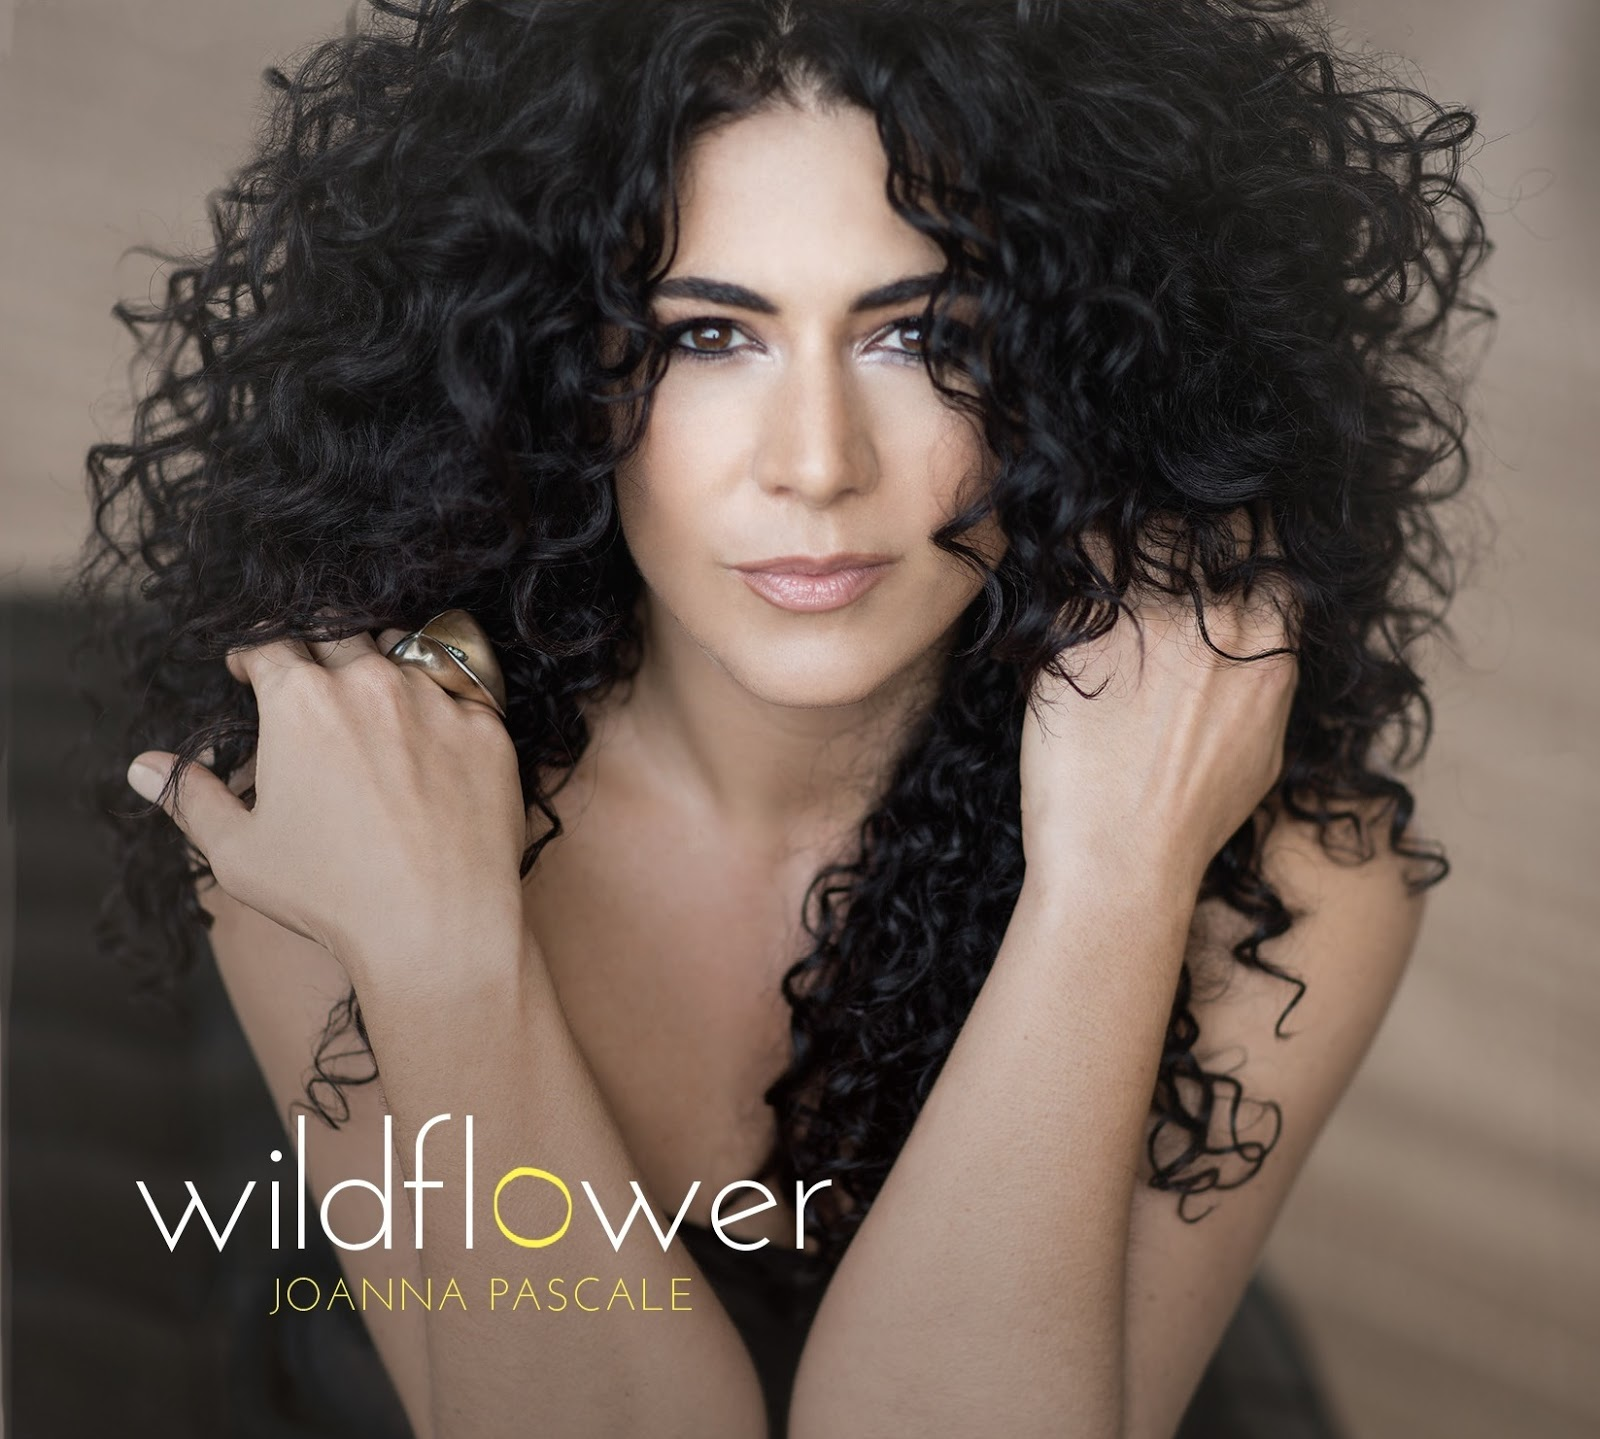 Wildflower  Joanna Pascale  2016